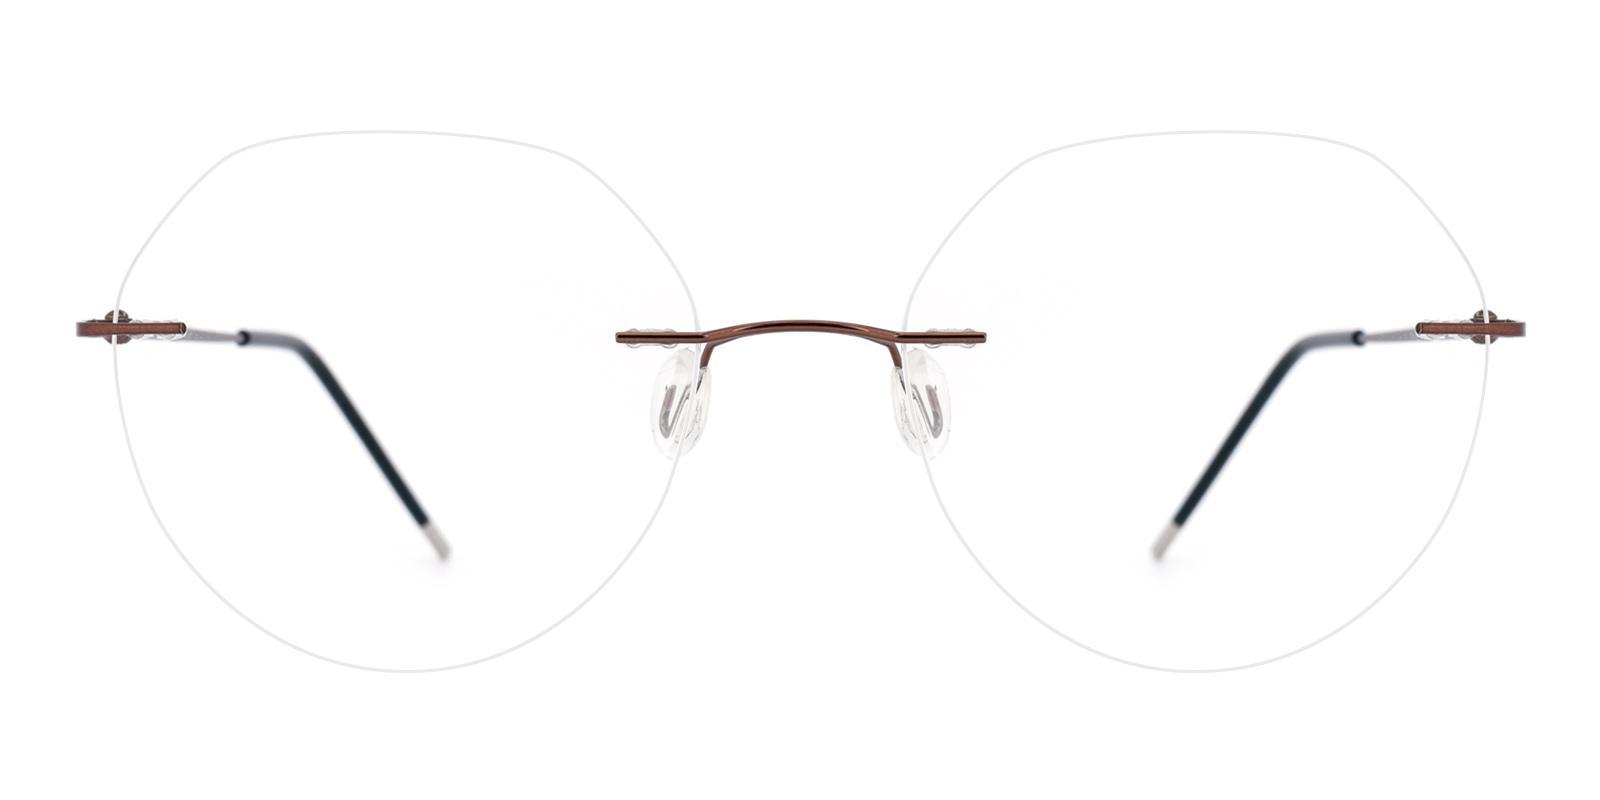 Invisible-Brown-Geometric-Metal-Eyeglasses-detail